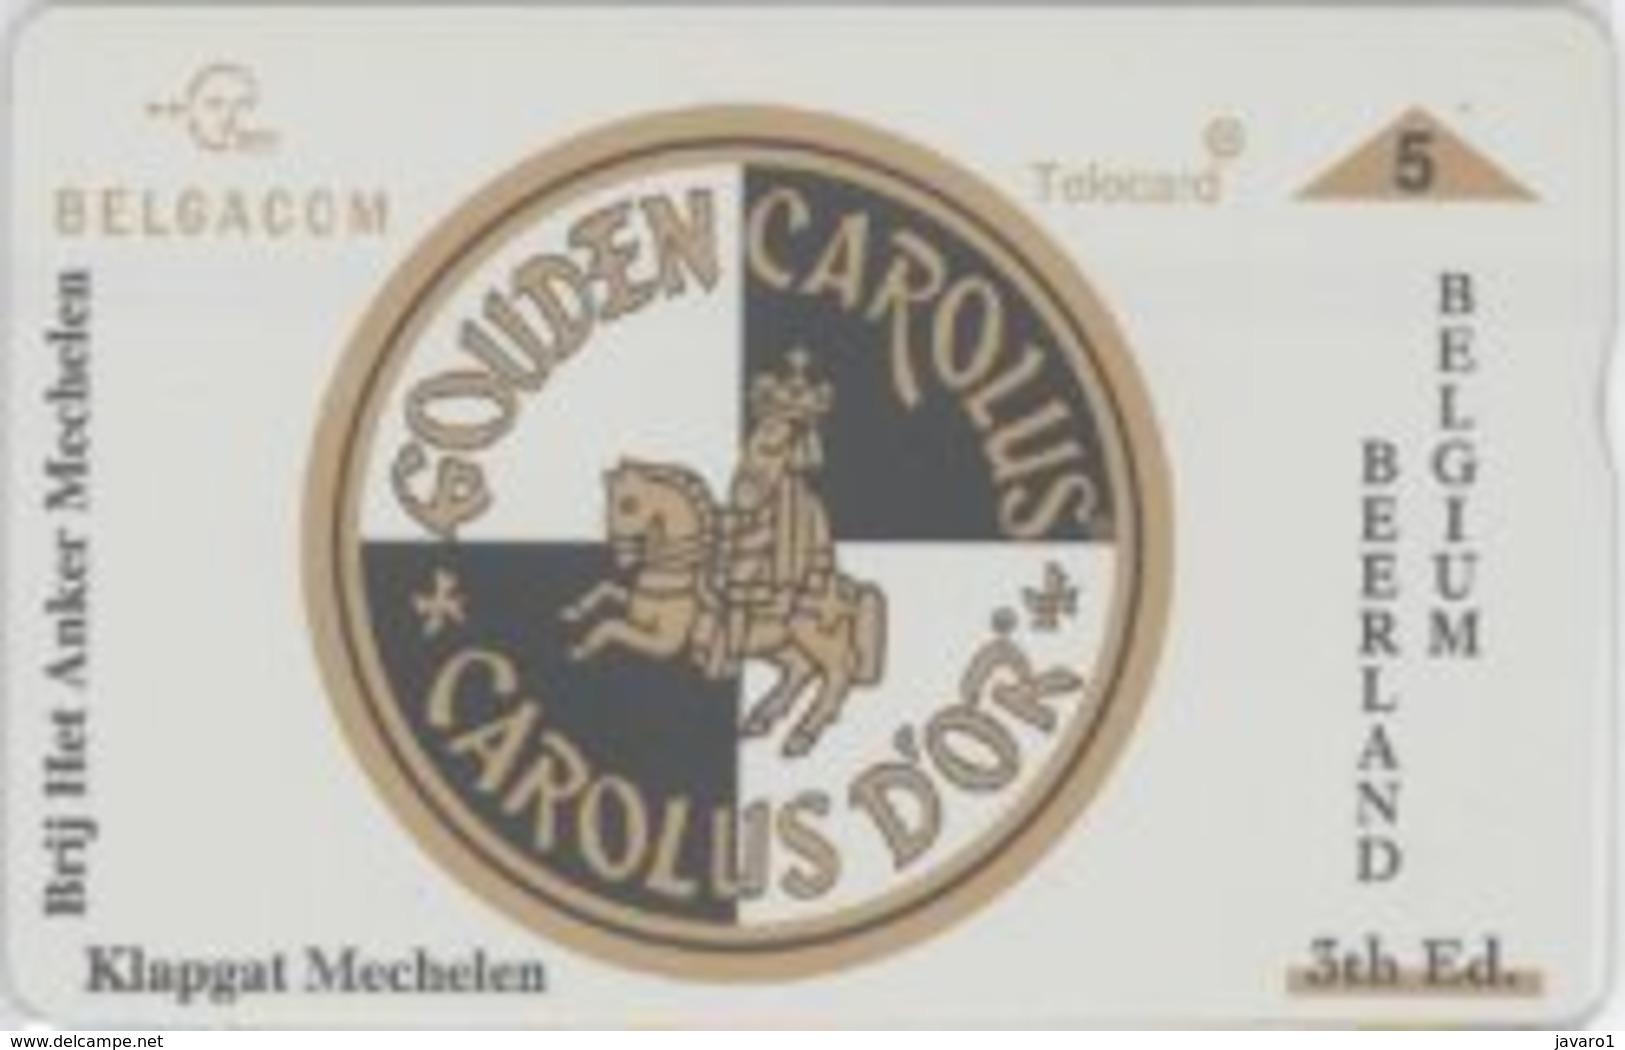 BPR-1996 : P373 5u GOUDEN CAROLUS 3rd ED.(beer) MINT - Belgien